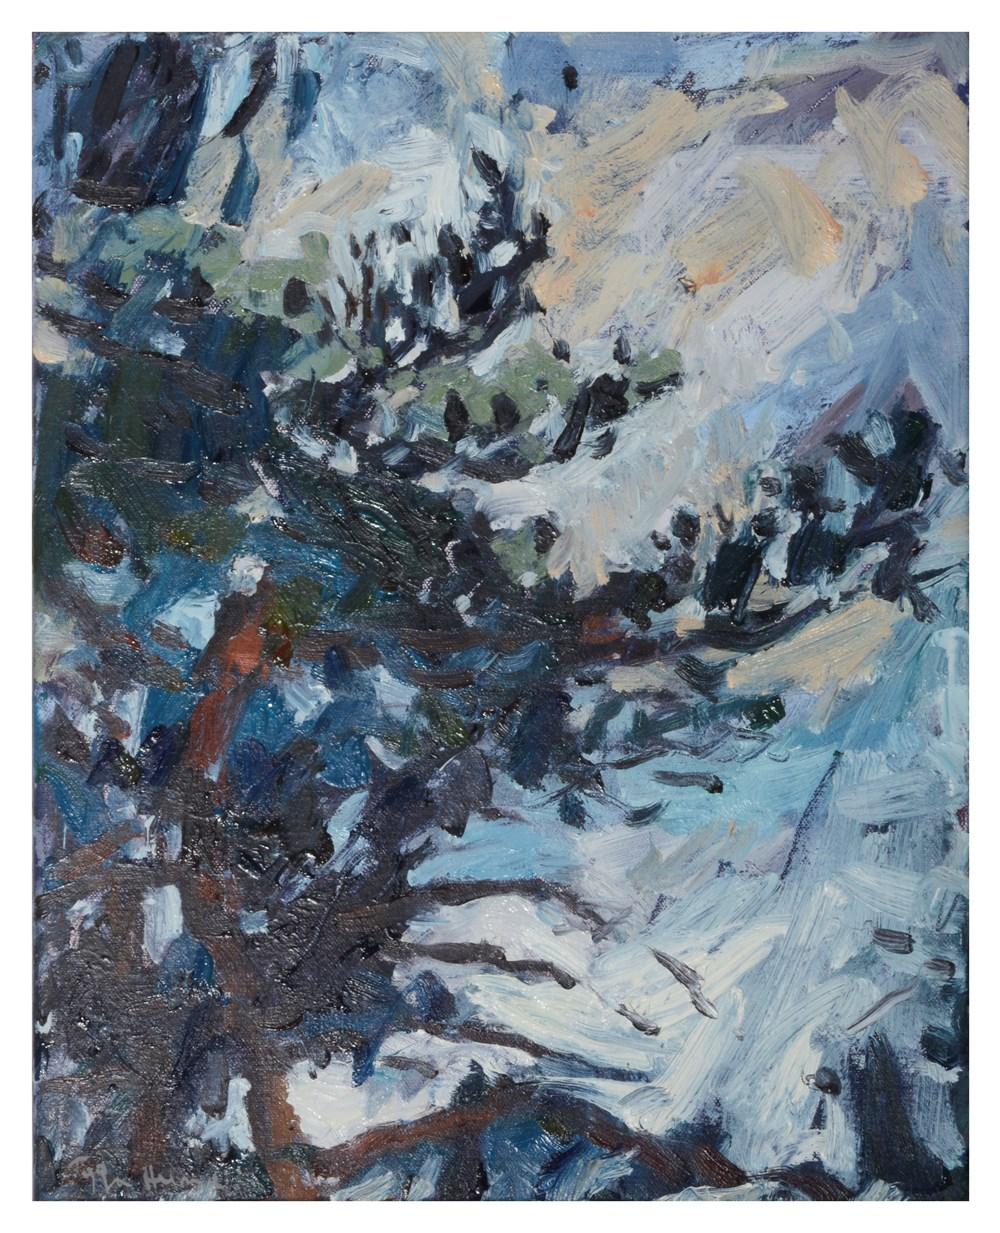 50 x £50 - Lot 23, Tyga Helme, The Moving Pine